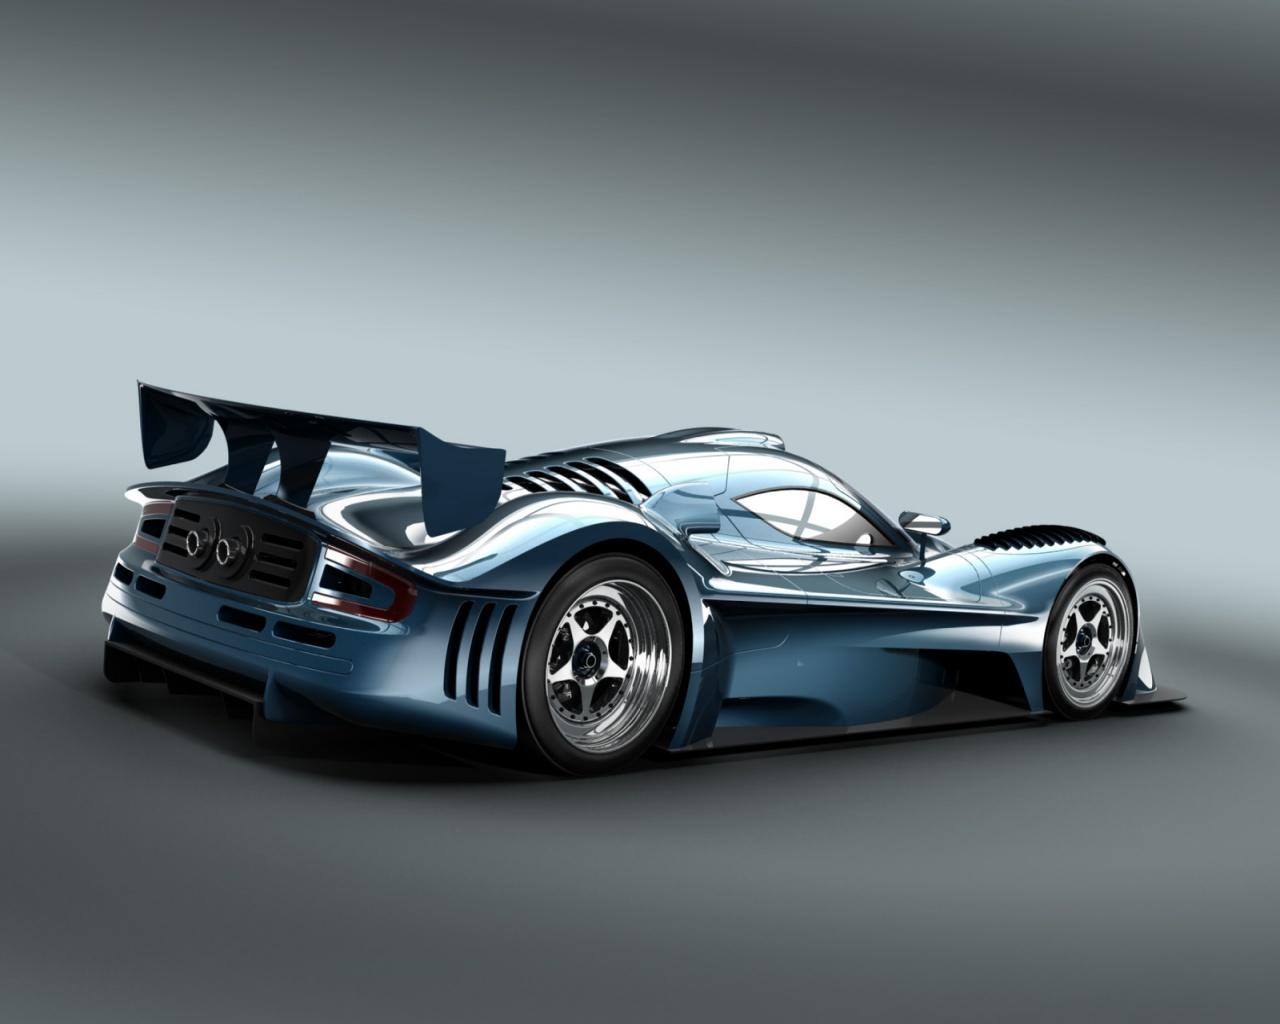 hd amazing cars s 10